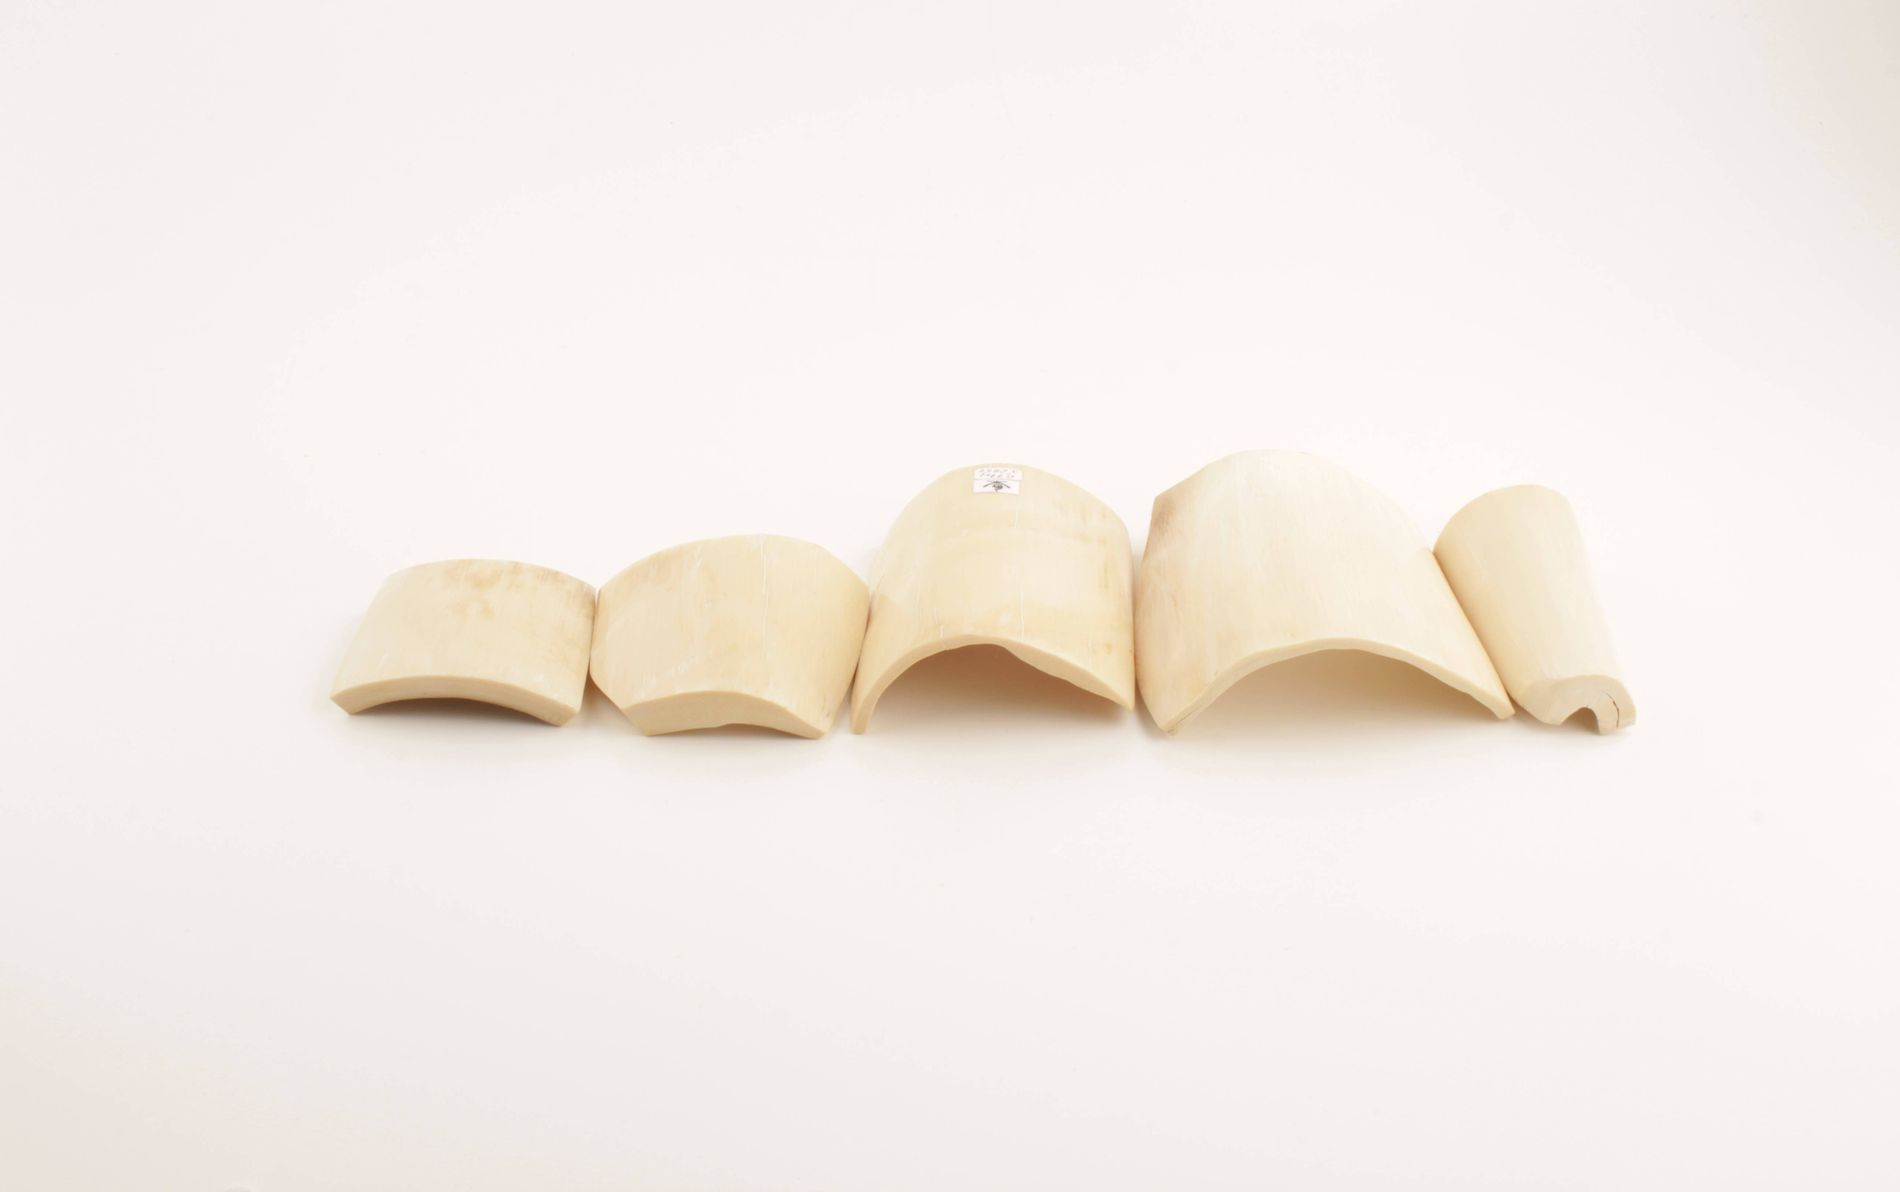 Cream-white mammoth ivory pieces